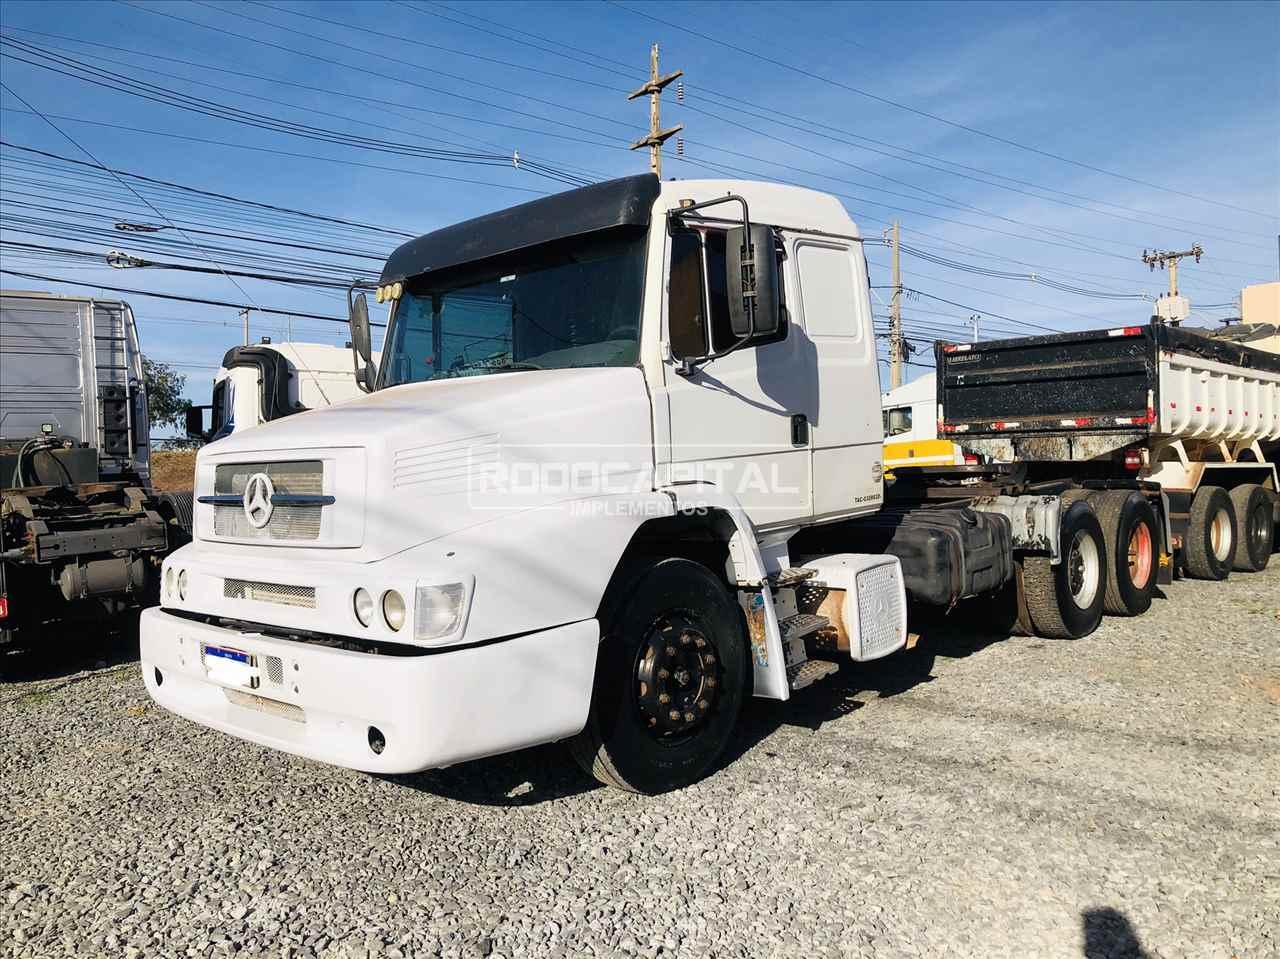 CAMINHAO MERCEDES-BENZ MB 1634 Cavalo Mecânico Truck 6x2 RODOCAPITAL - TRUCKVAN BRASILIA DISTRITO FEDERAL DF